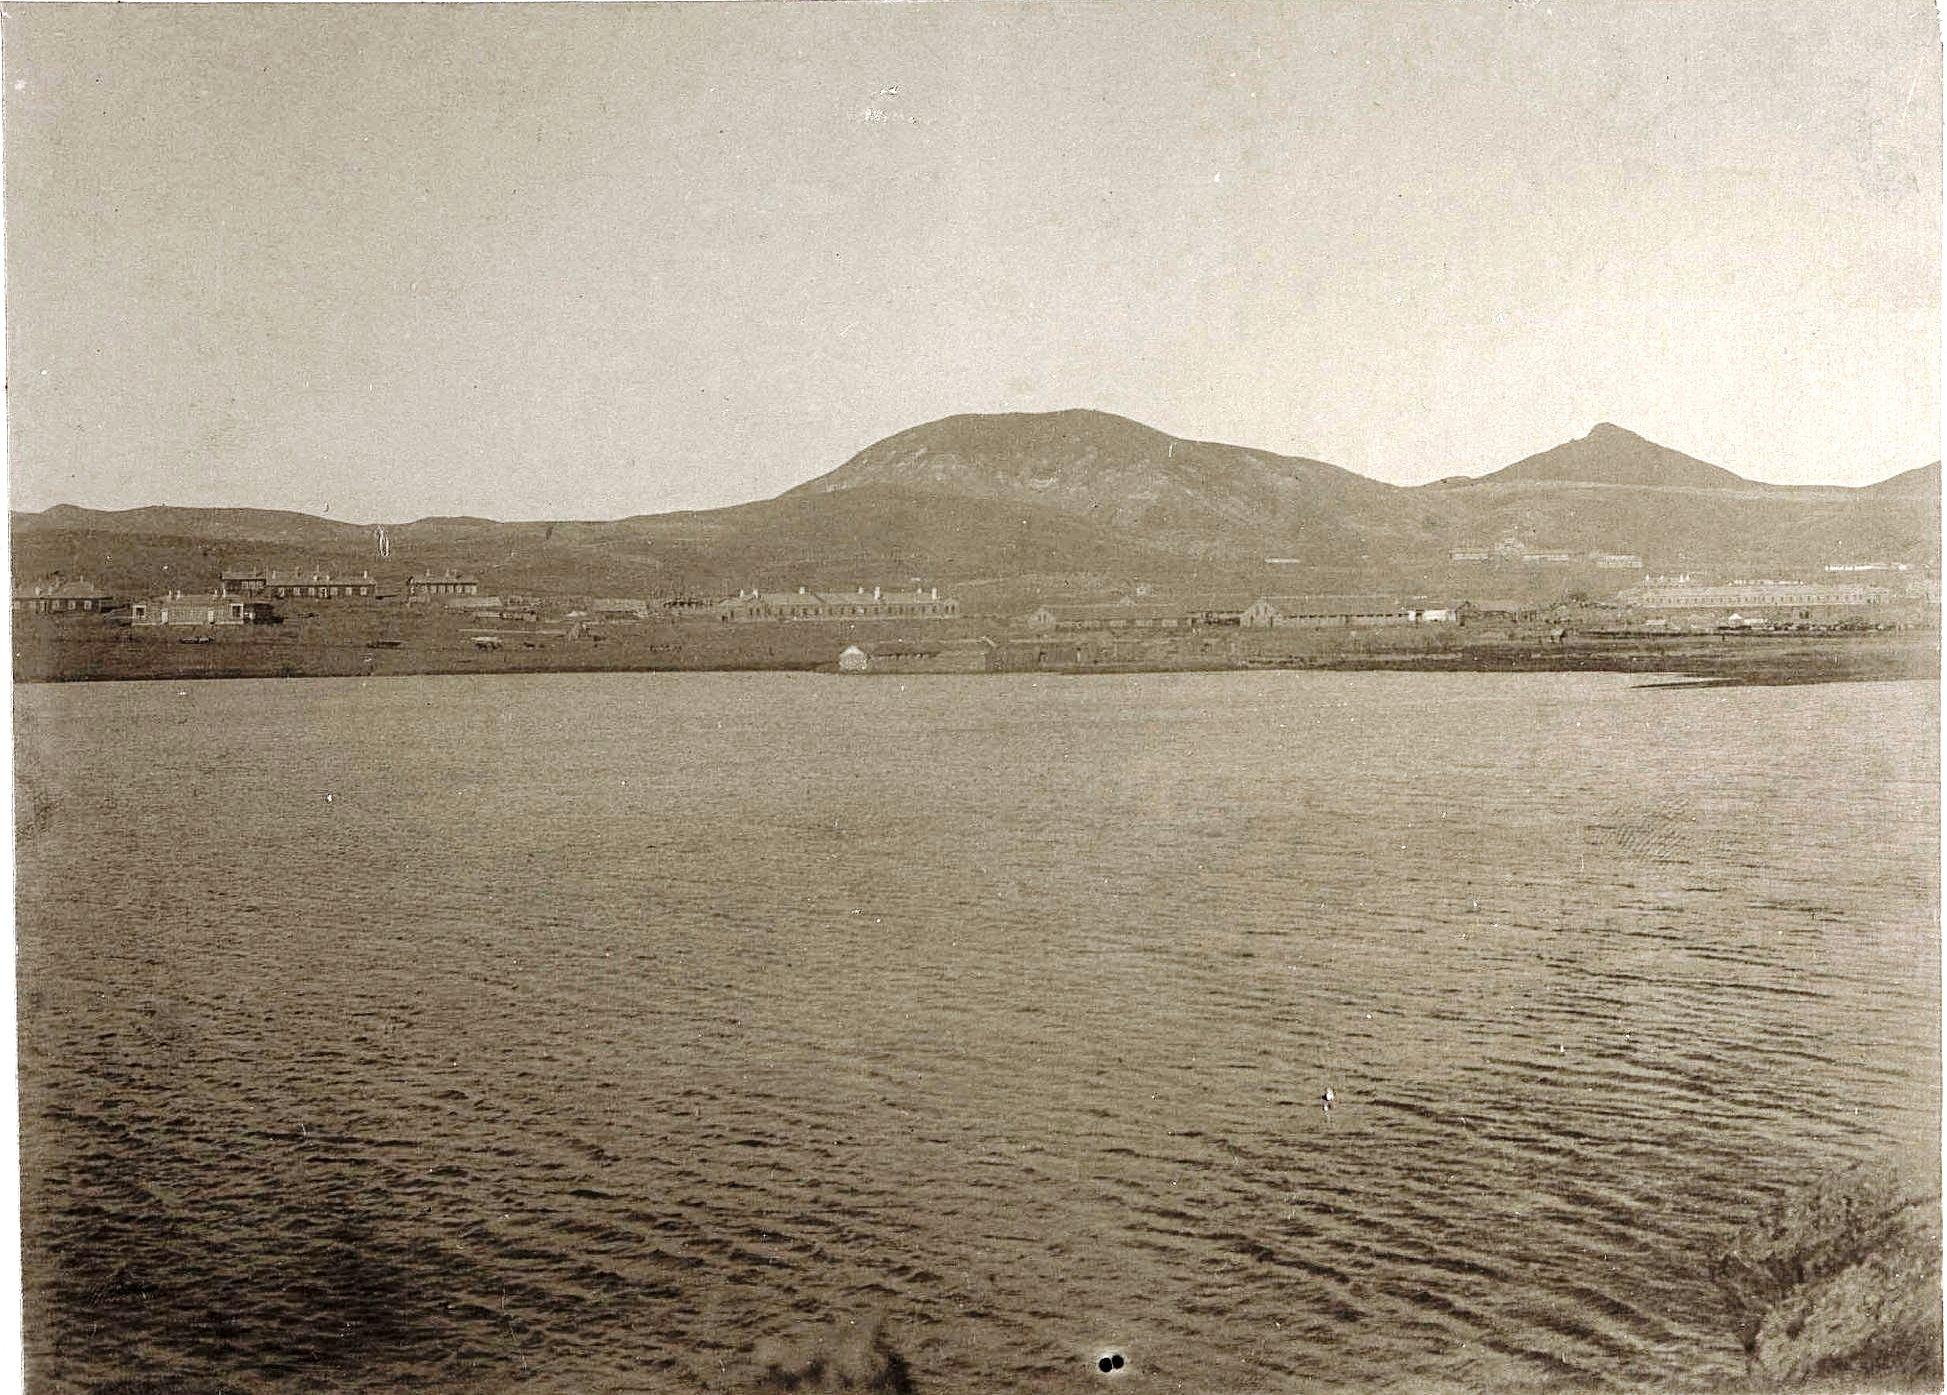 Порт-Артур. Полупресное озеро. 1900